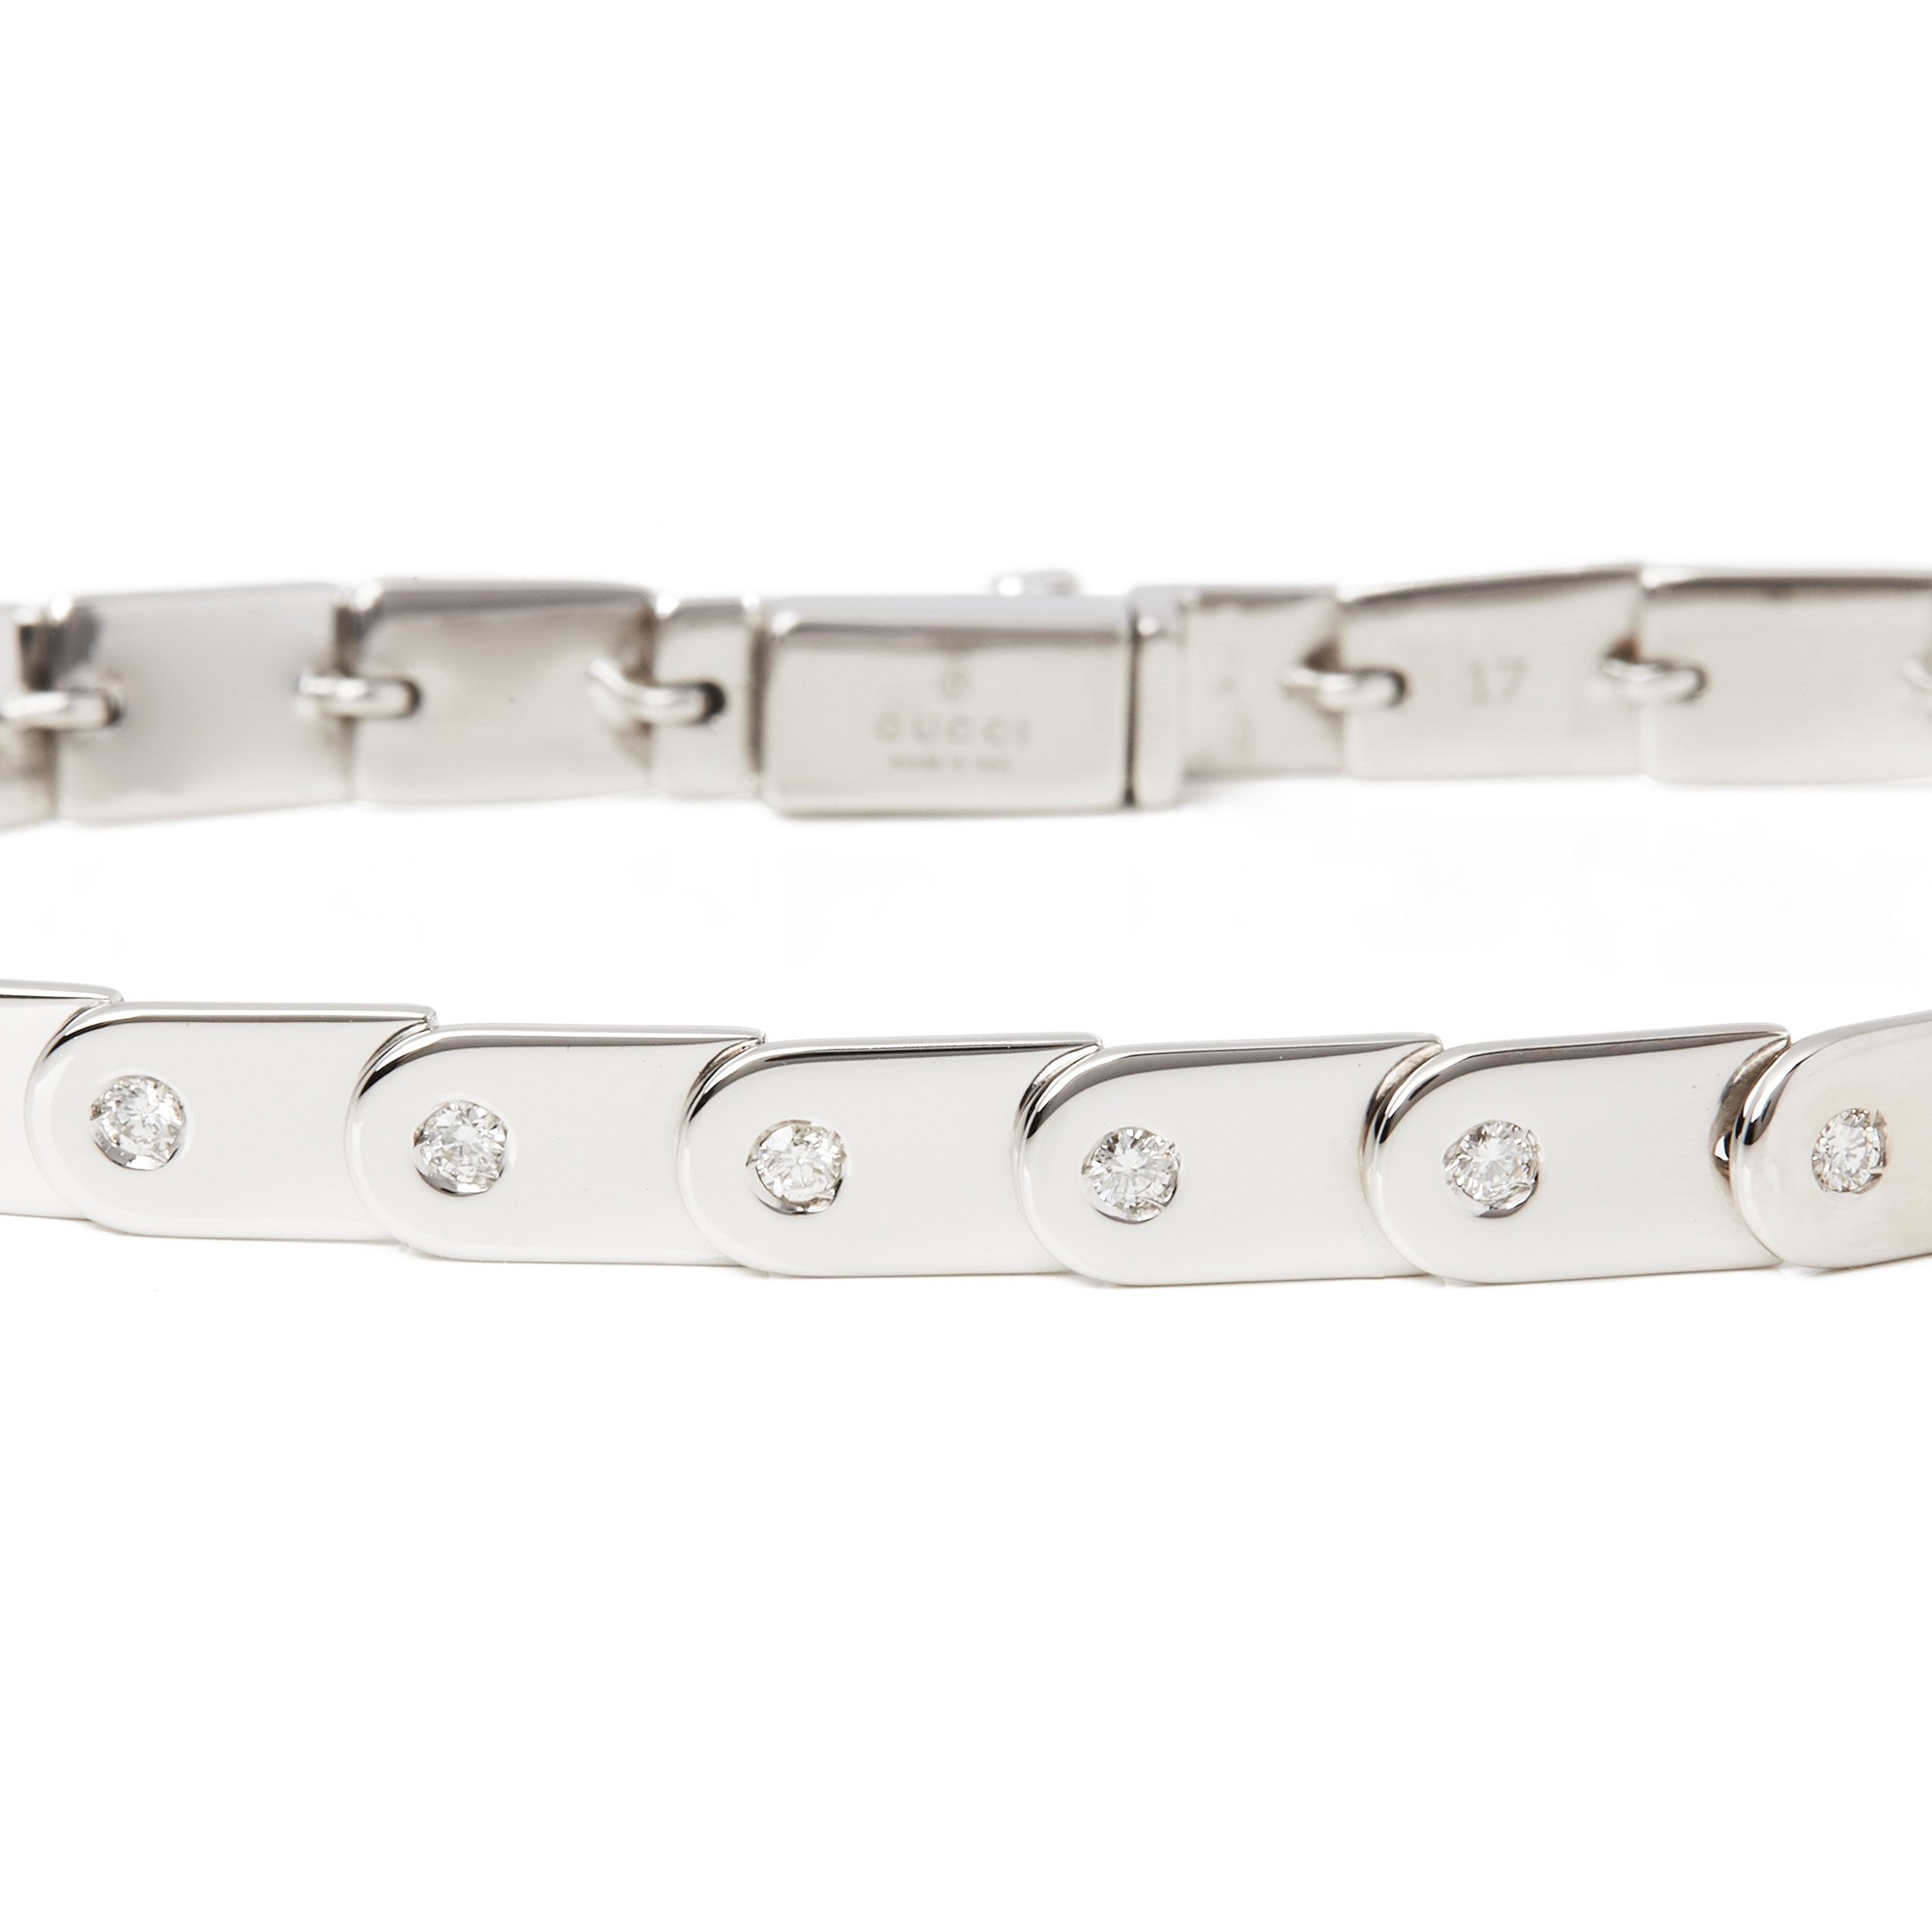 Gucci 18k White Gold Diamond Set Link Bracelet